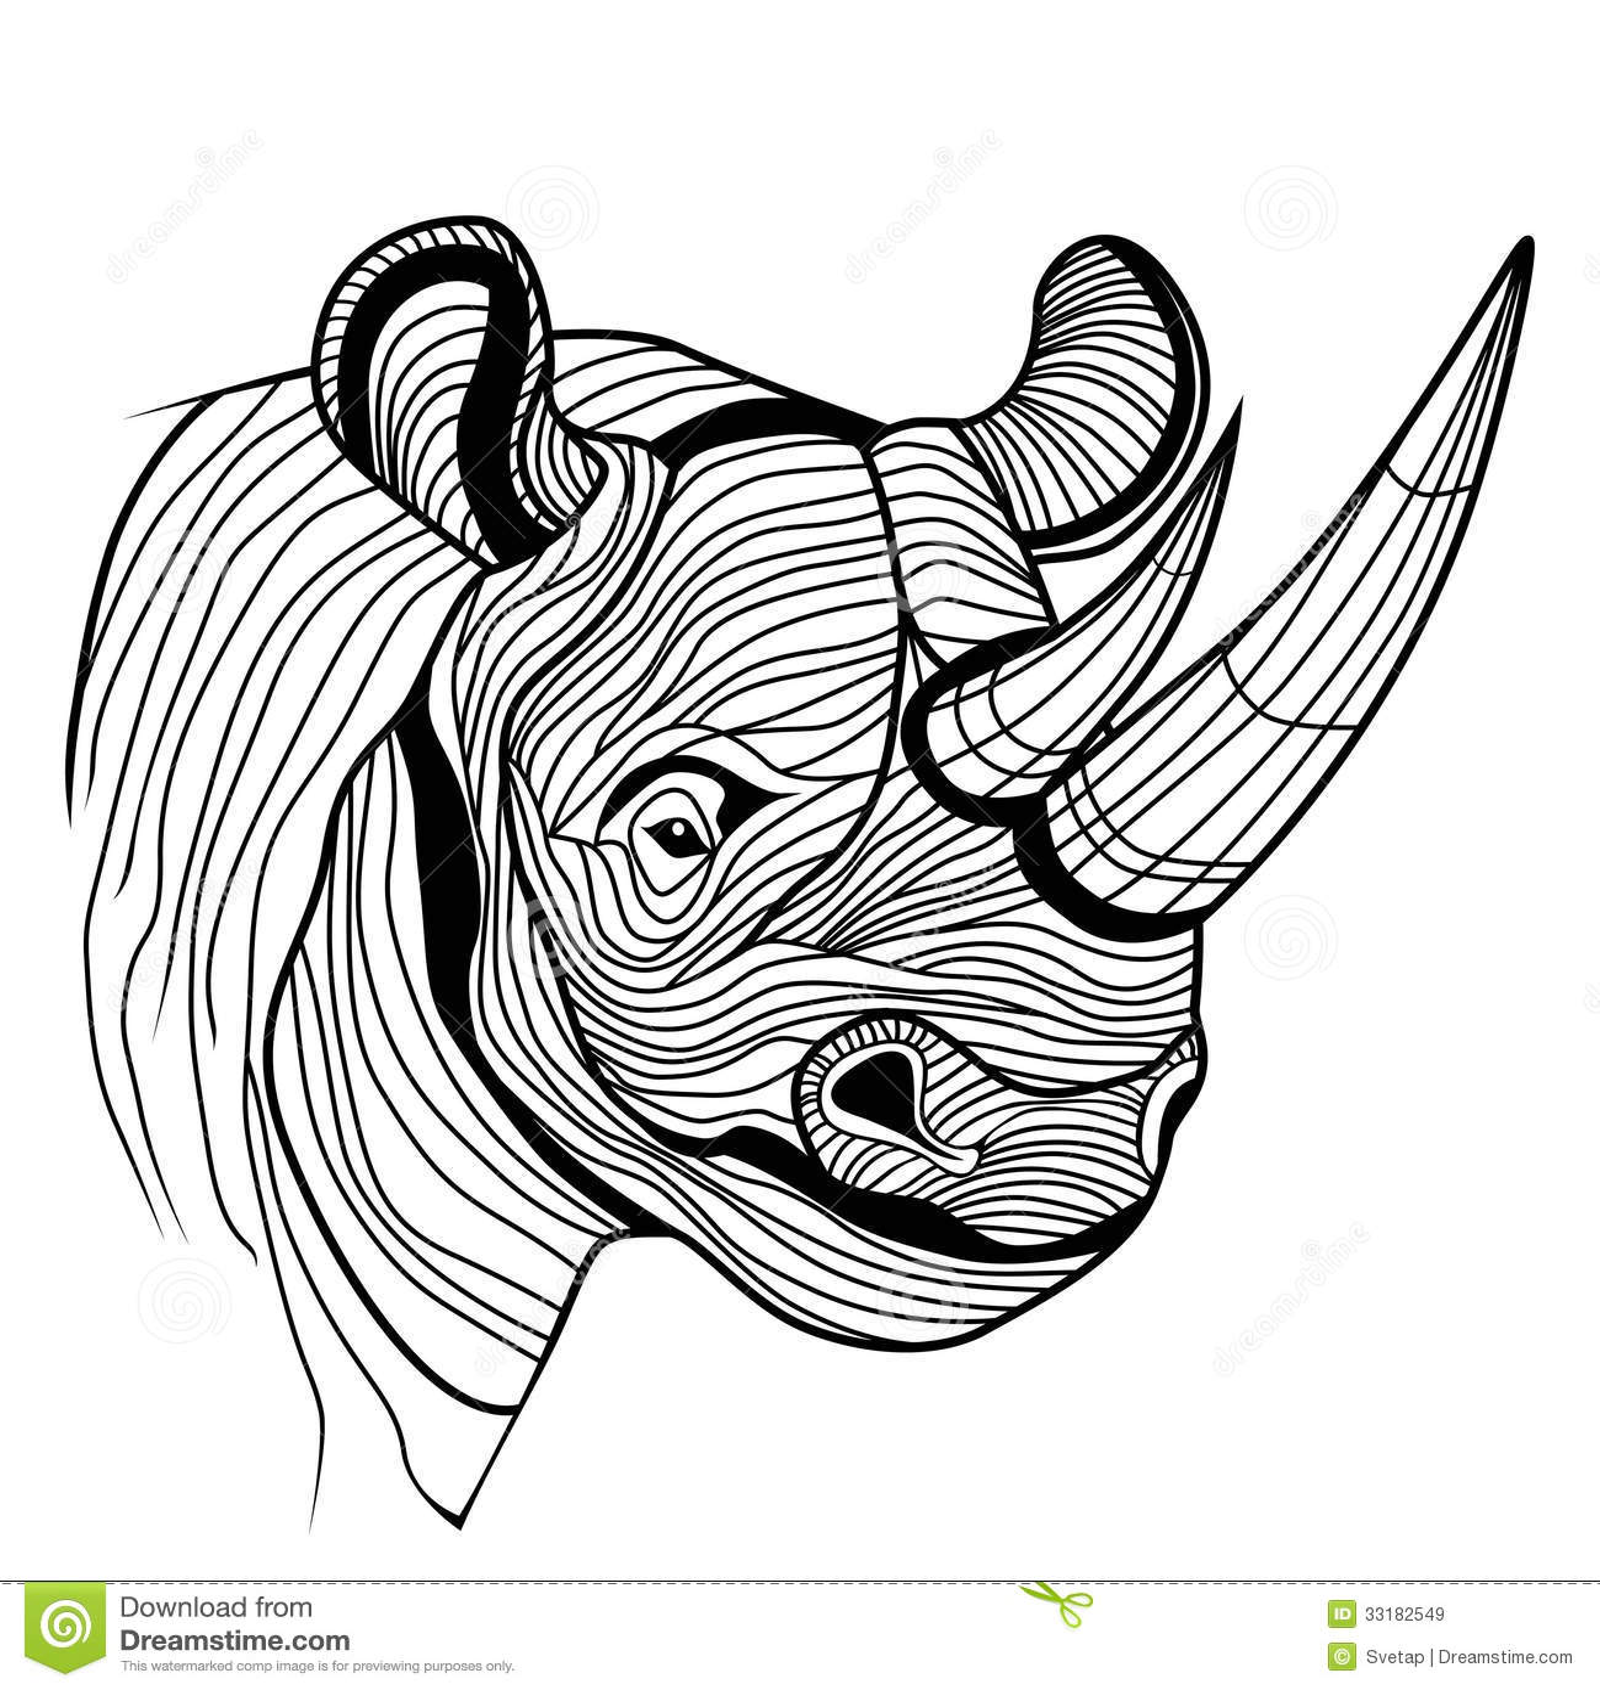 Rhino Rhinoceros Animal Head Stock Vector - Image: 33182549